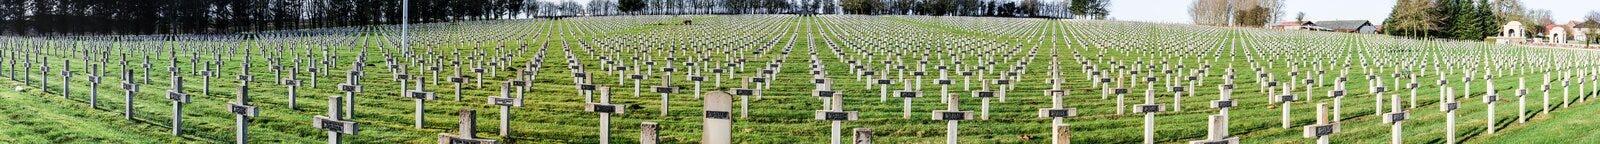 Panorama-Kirchhoferster weltkrieg in La Targette Frankreichs Vimy Stockfotos